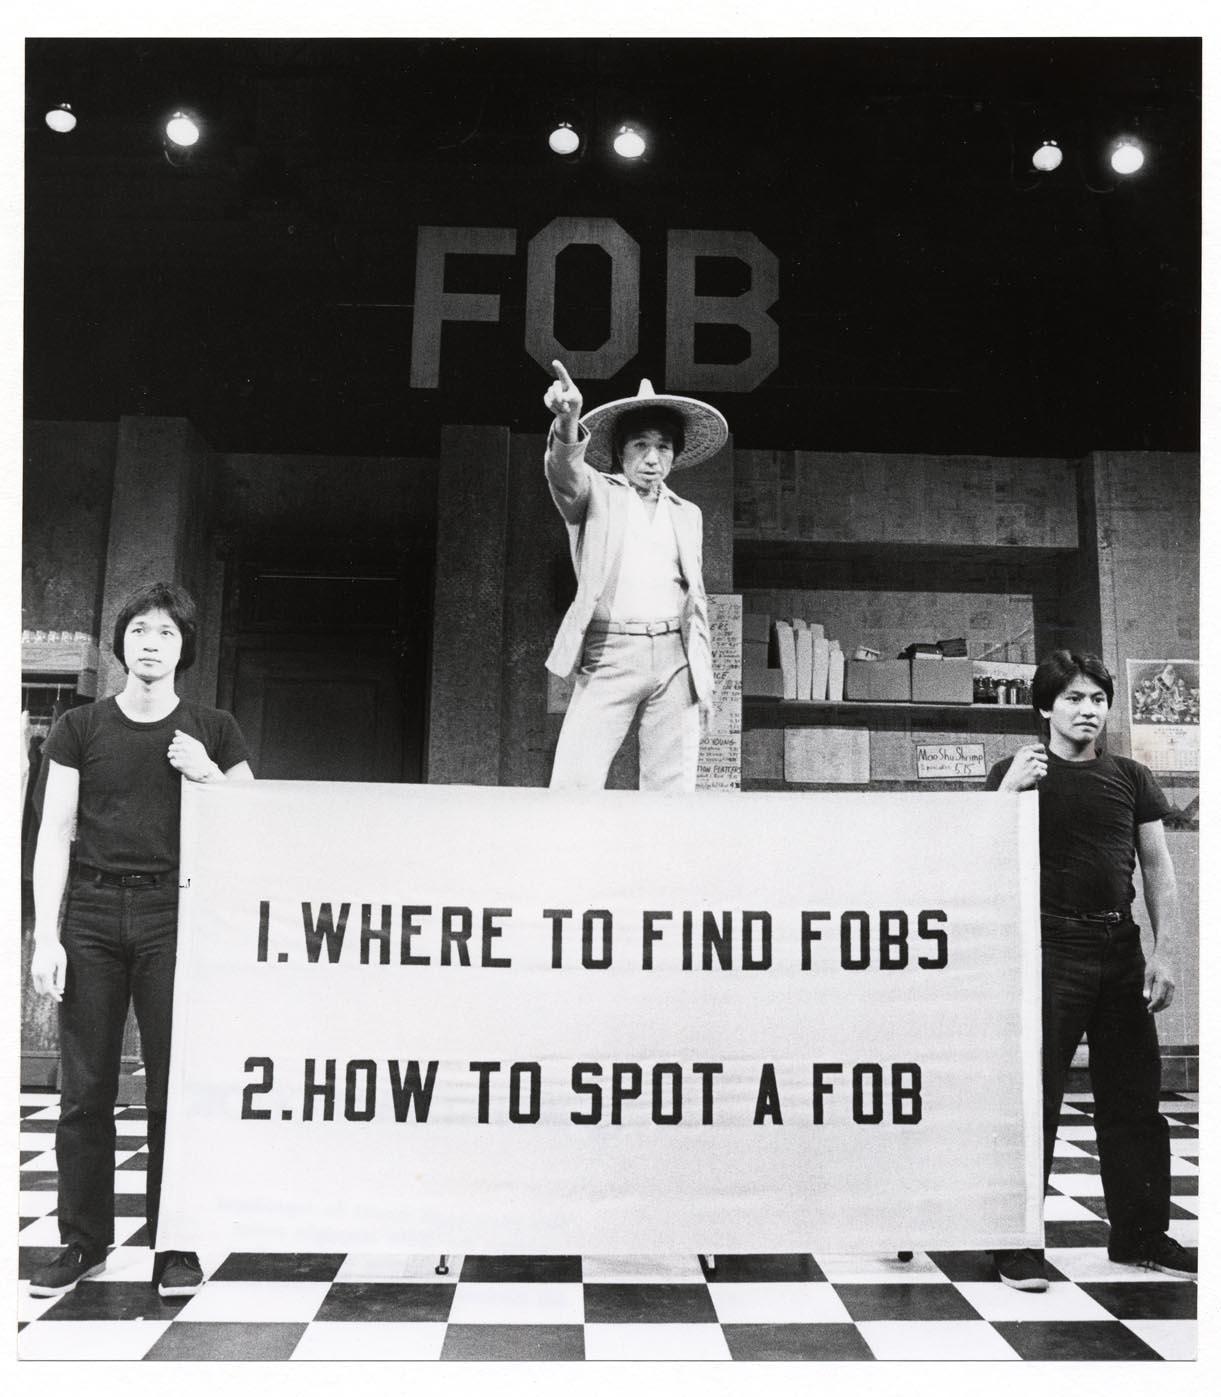 Tzi Ma, Calvin Jung, 和Willy Corpus1980年《FOB》在公共剧院的演出中。摄影:Martha Swope